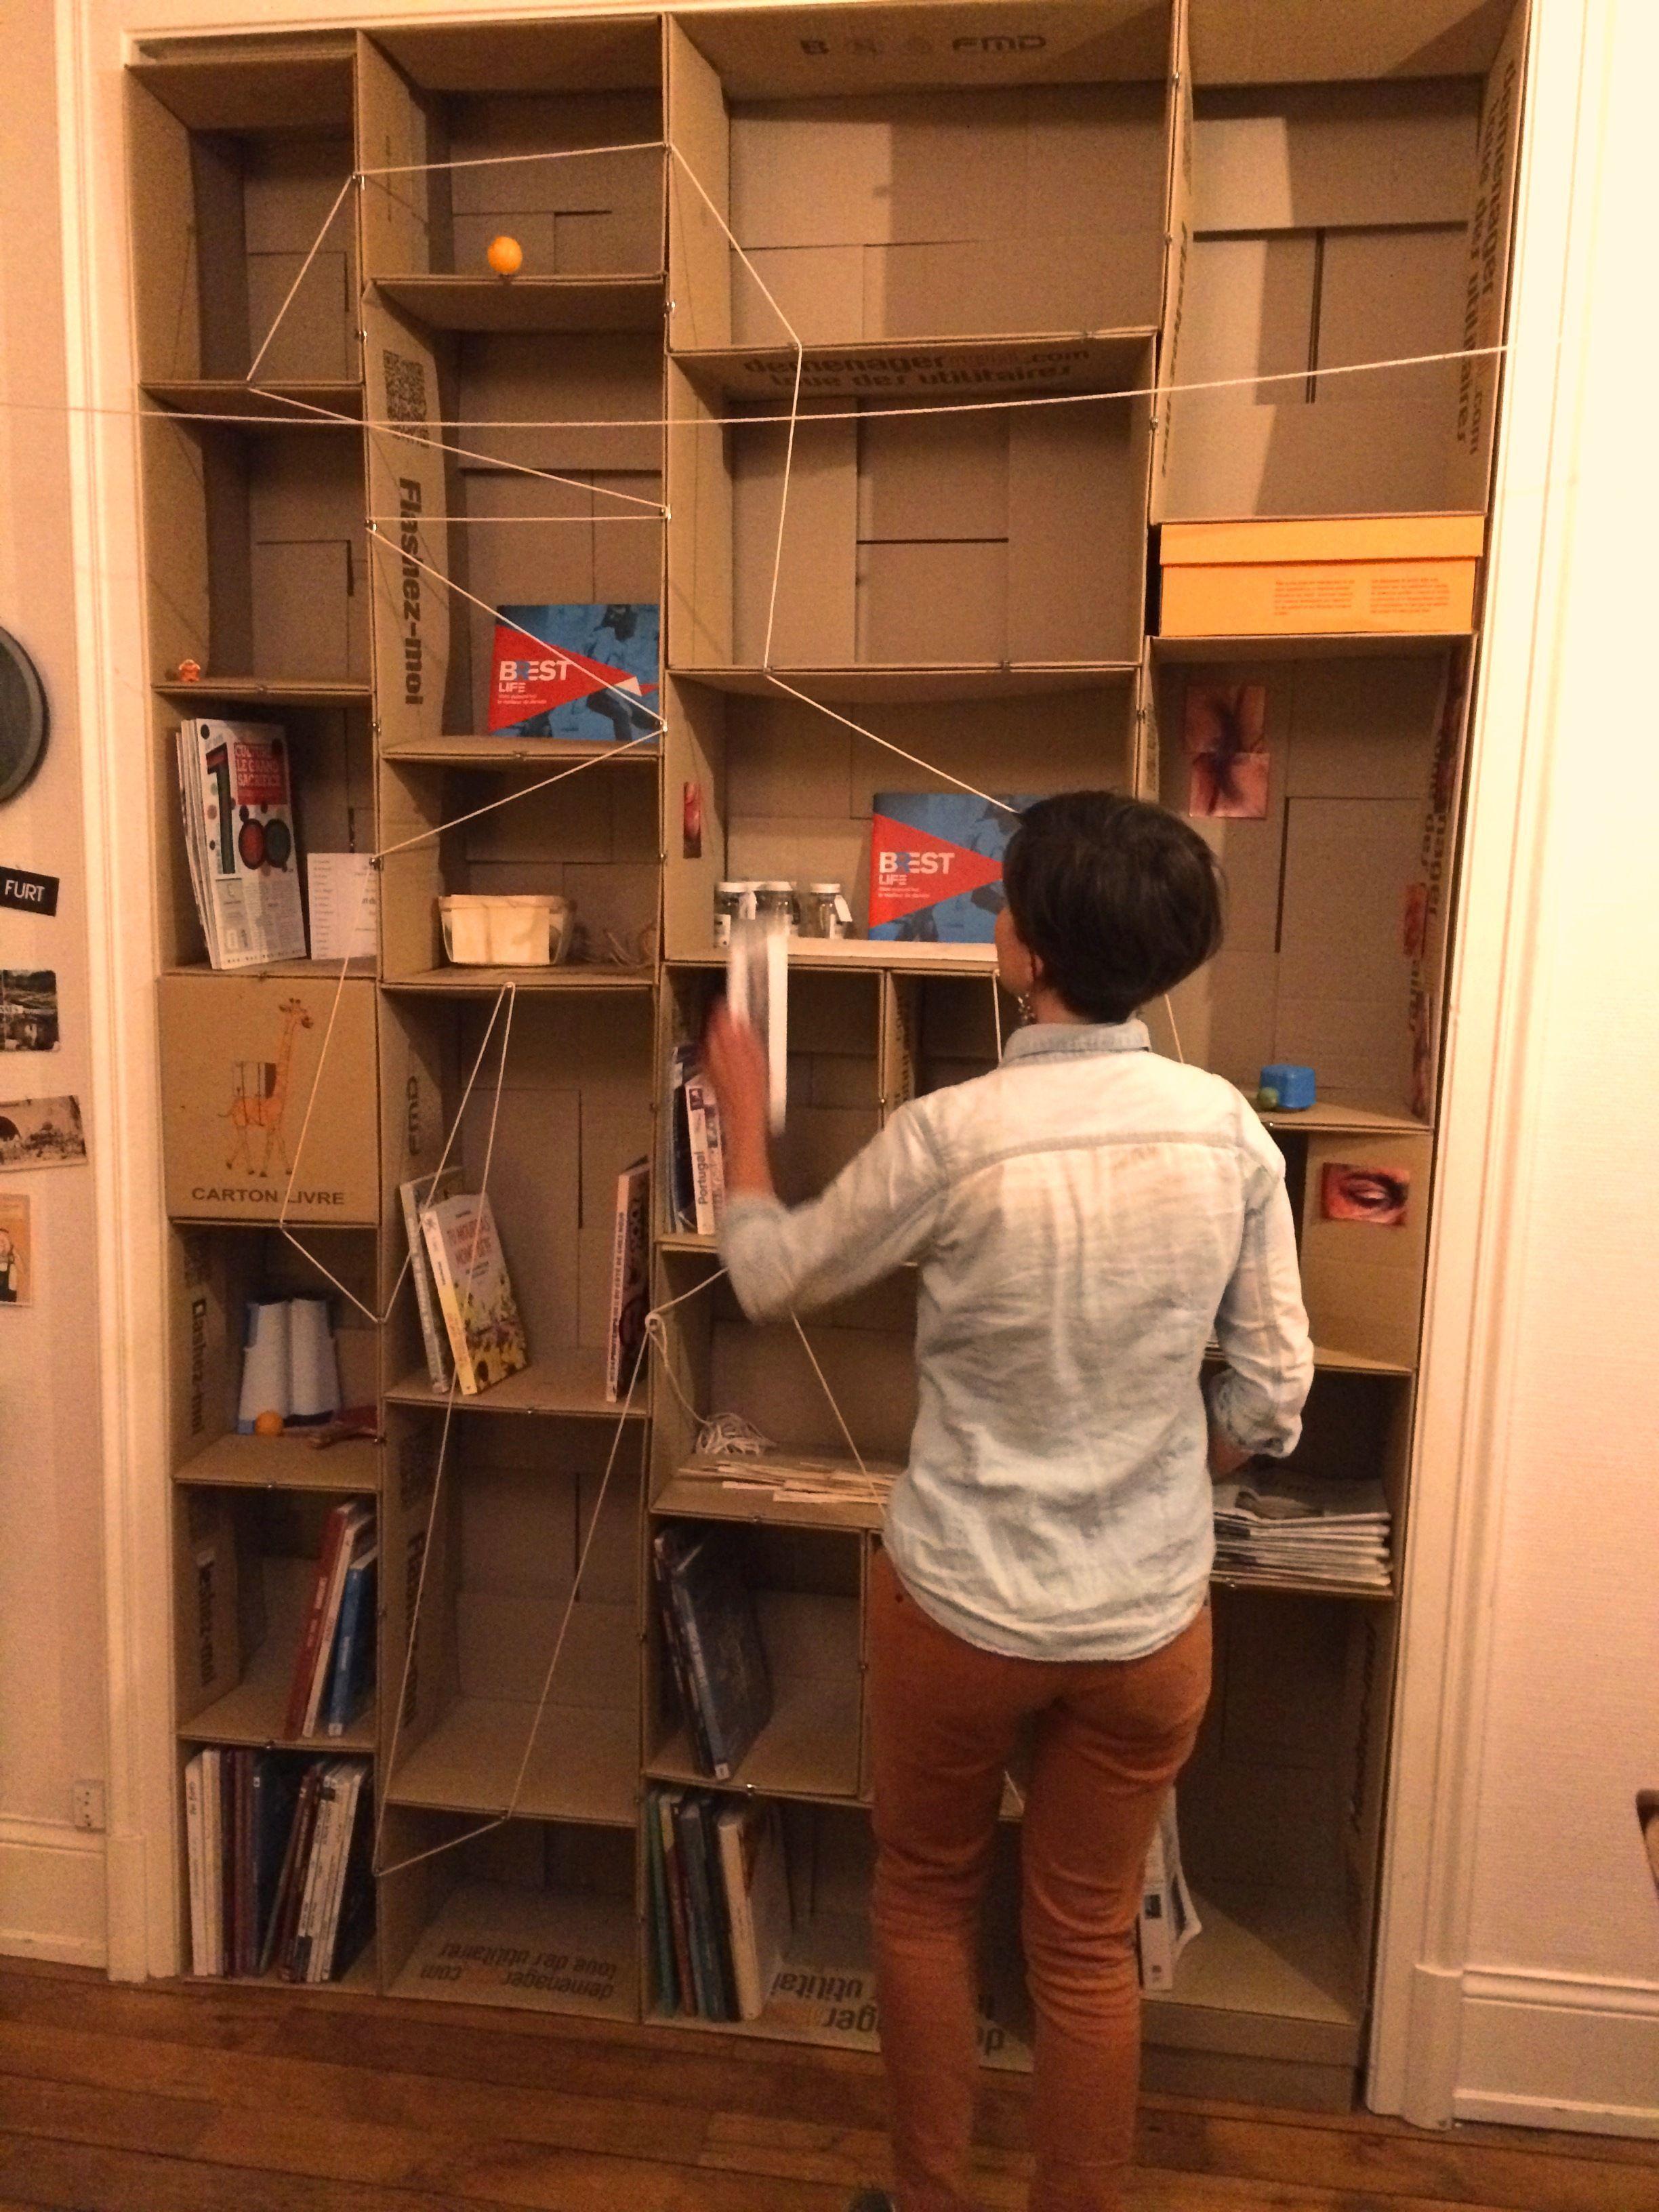 15 Inspiring Wooden Room Divider Cabinets Ideas In 2019